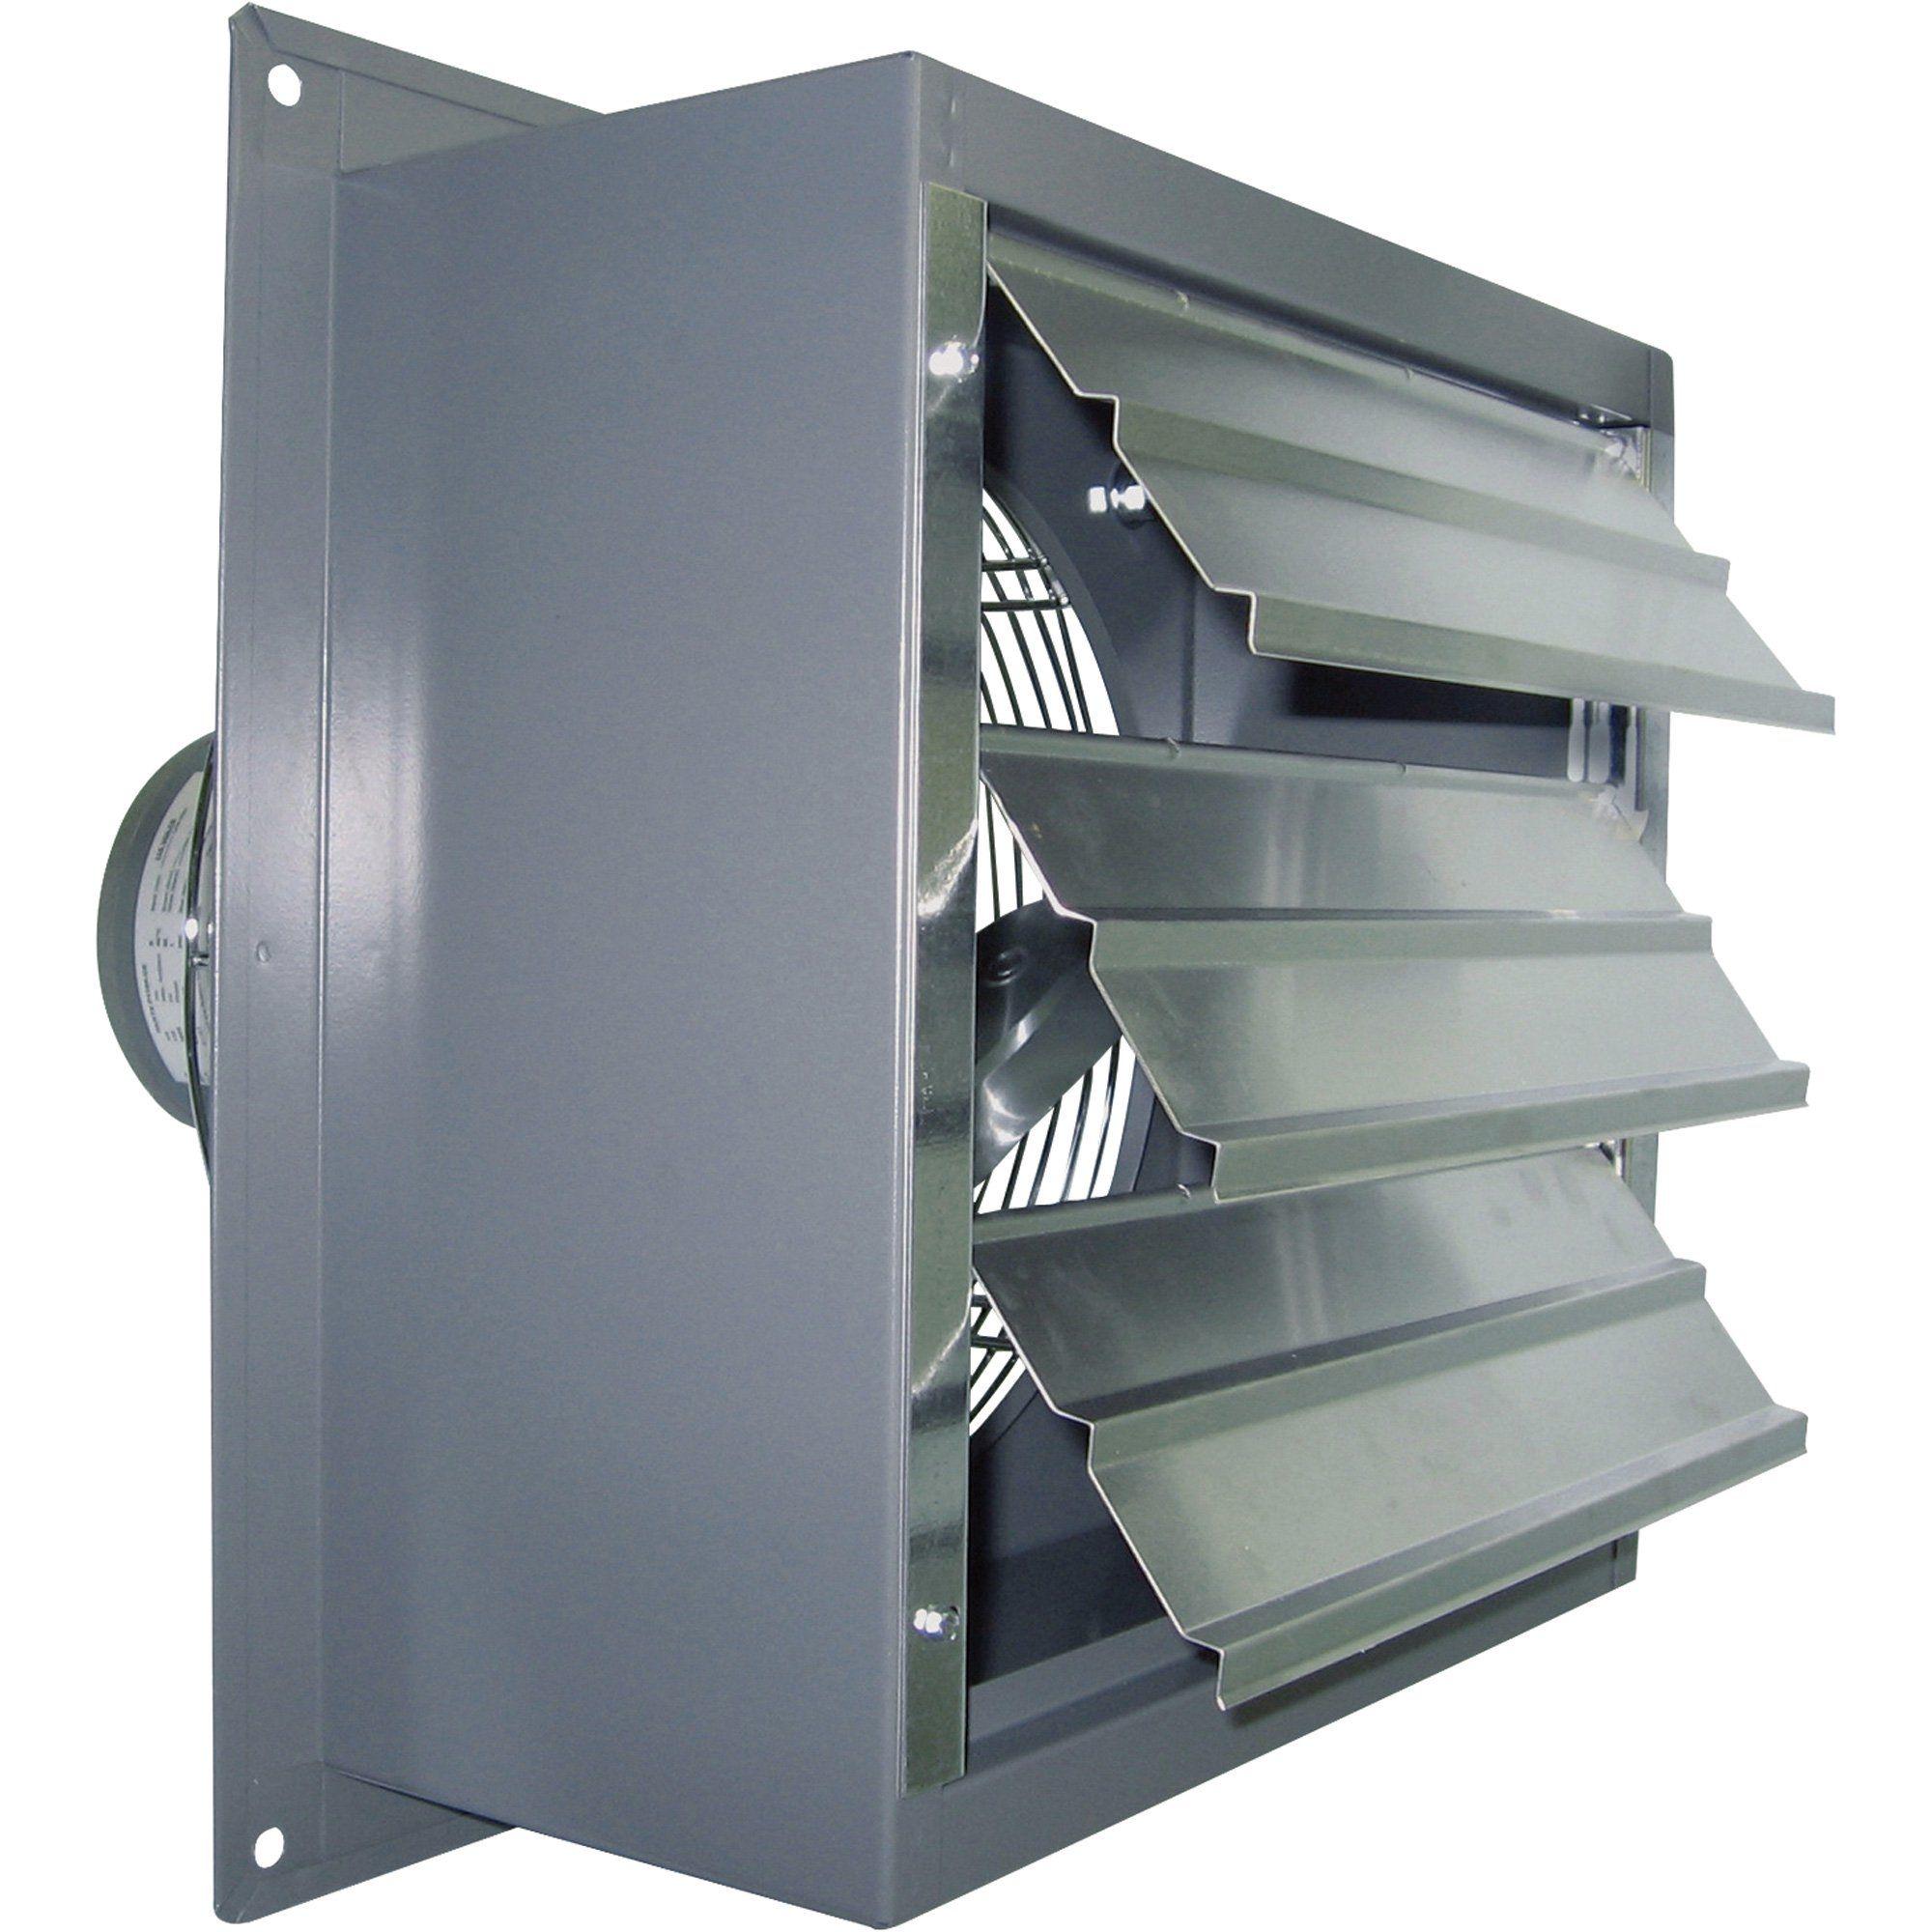 2000 cfm wall mounted exhaust fan | http://urresults/ | pinterest